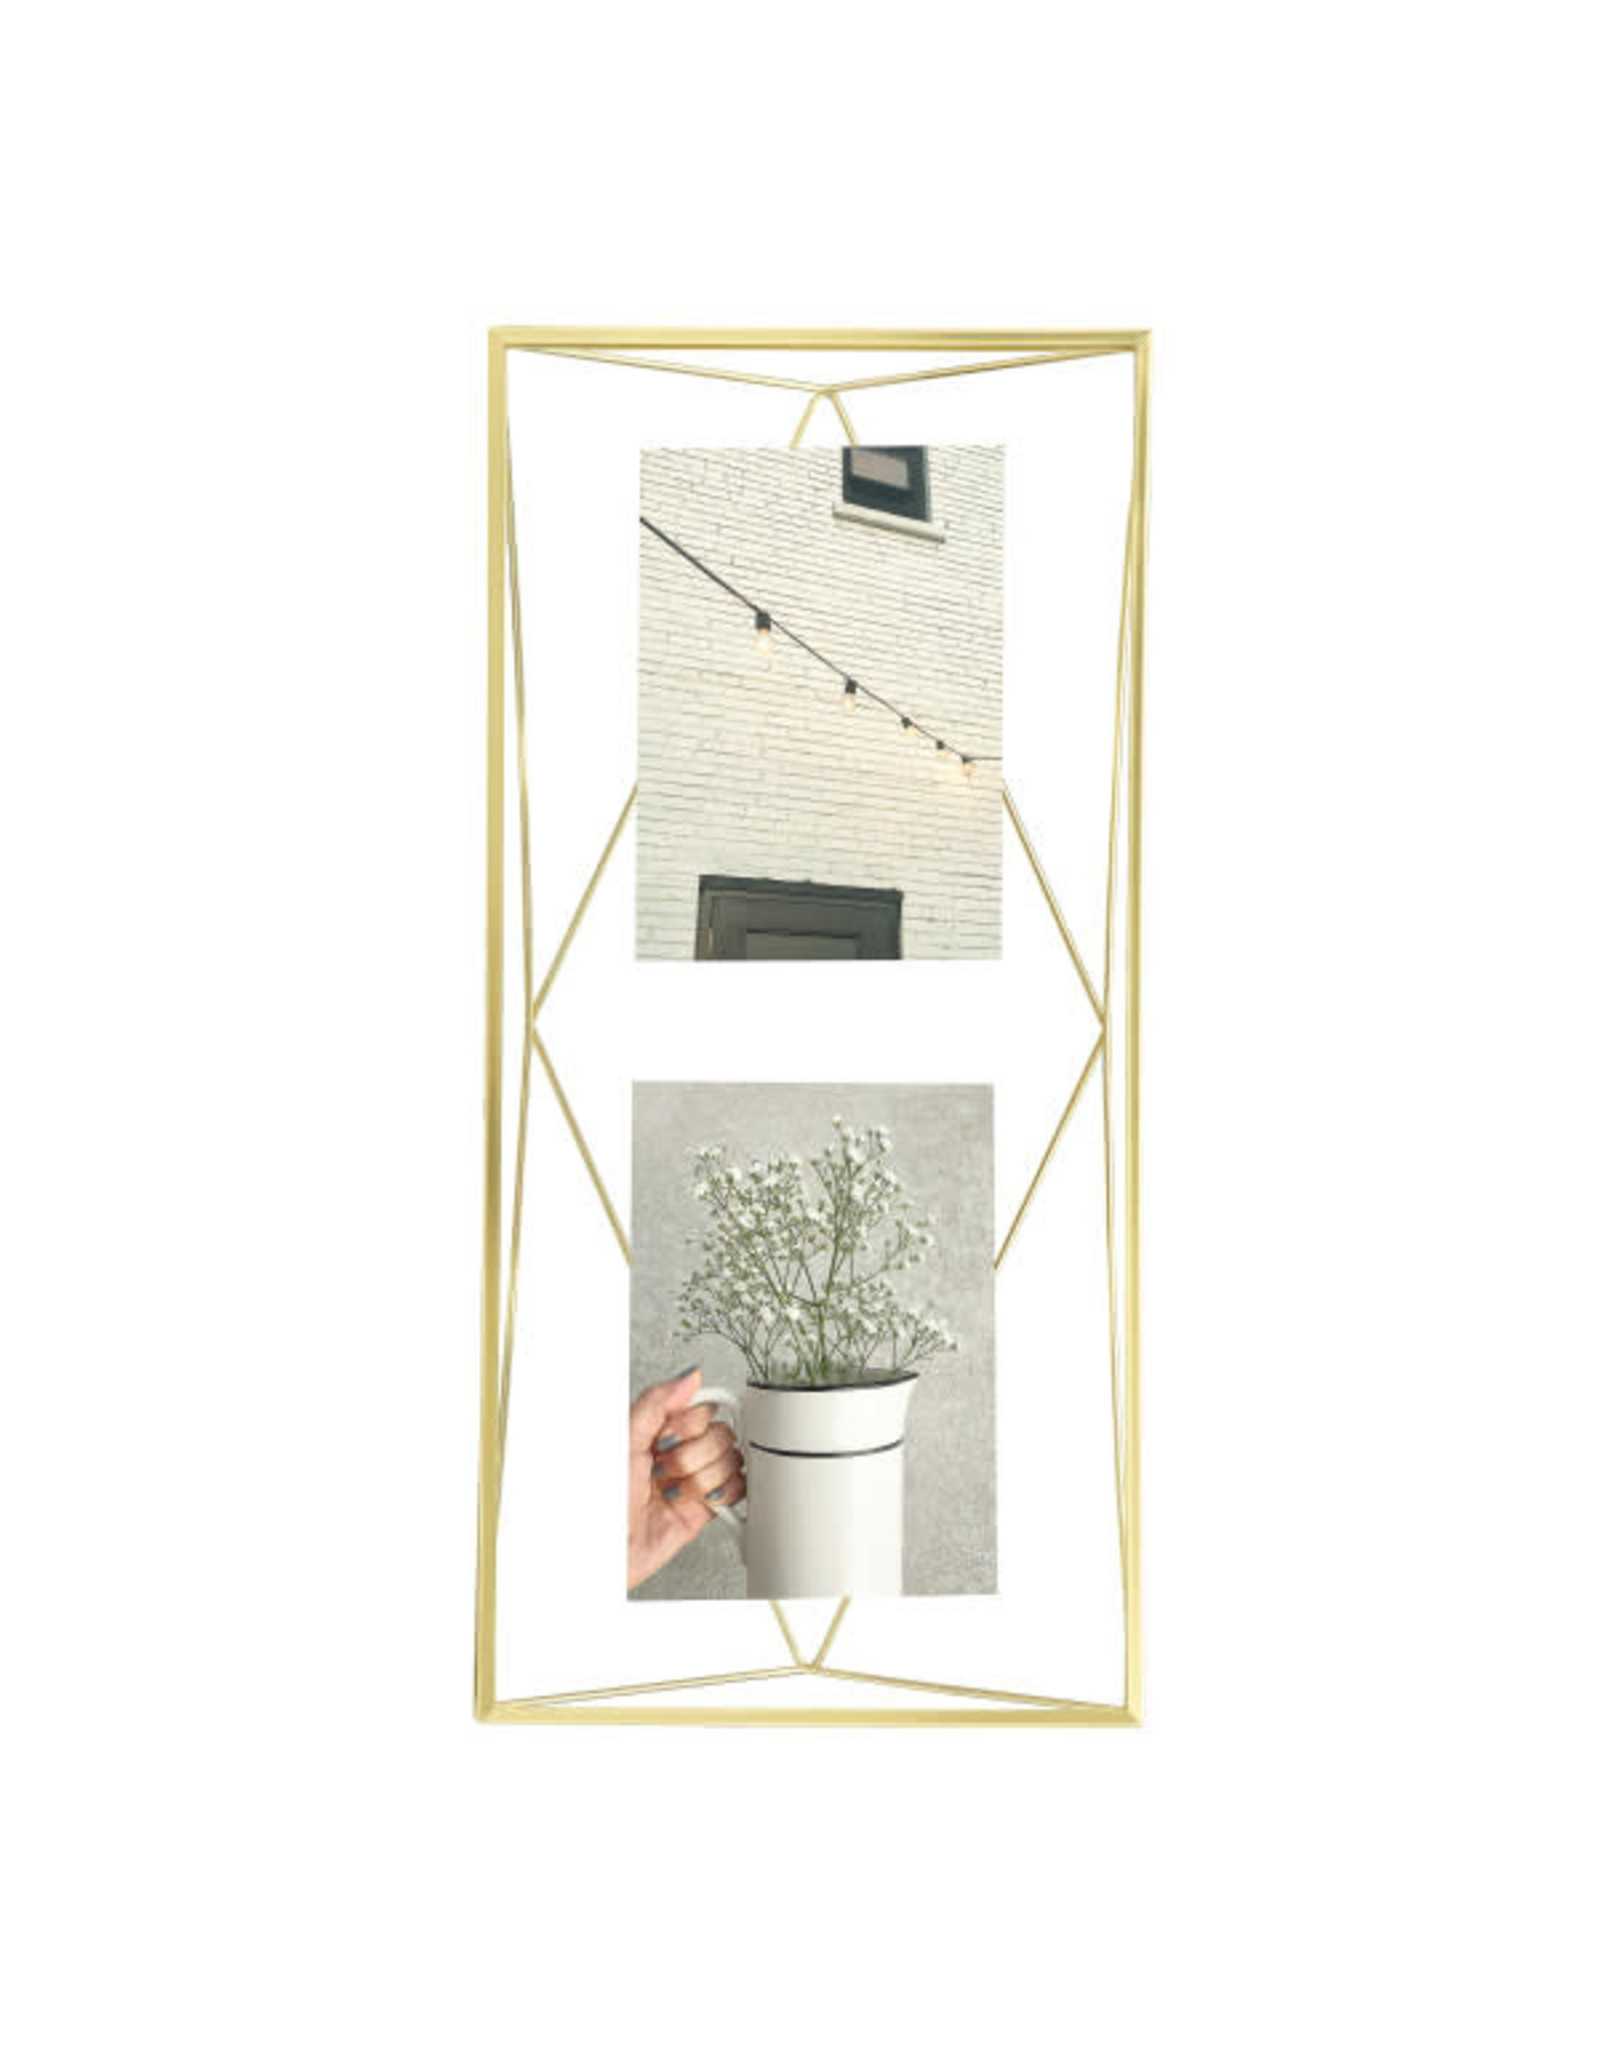 Umbra multi photo frame - prisma (gold)